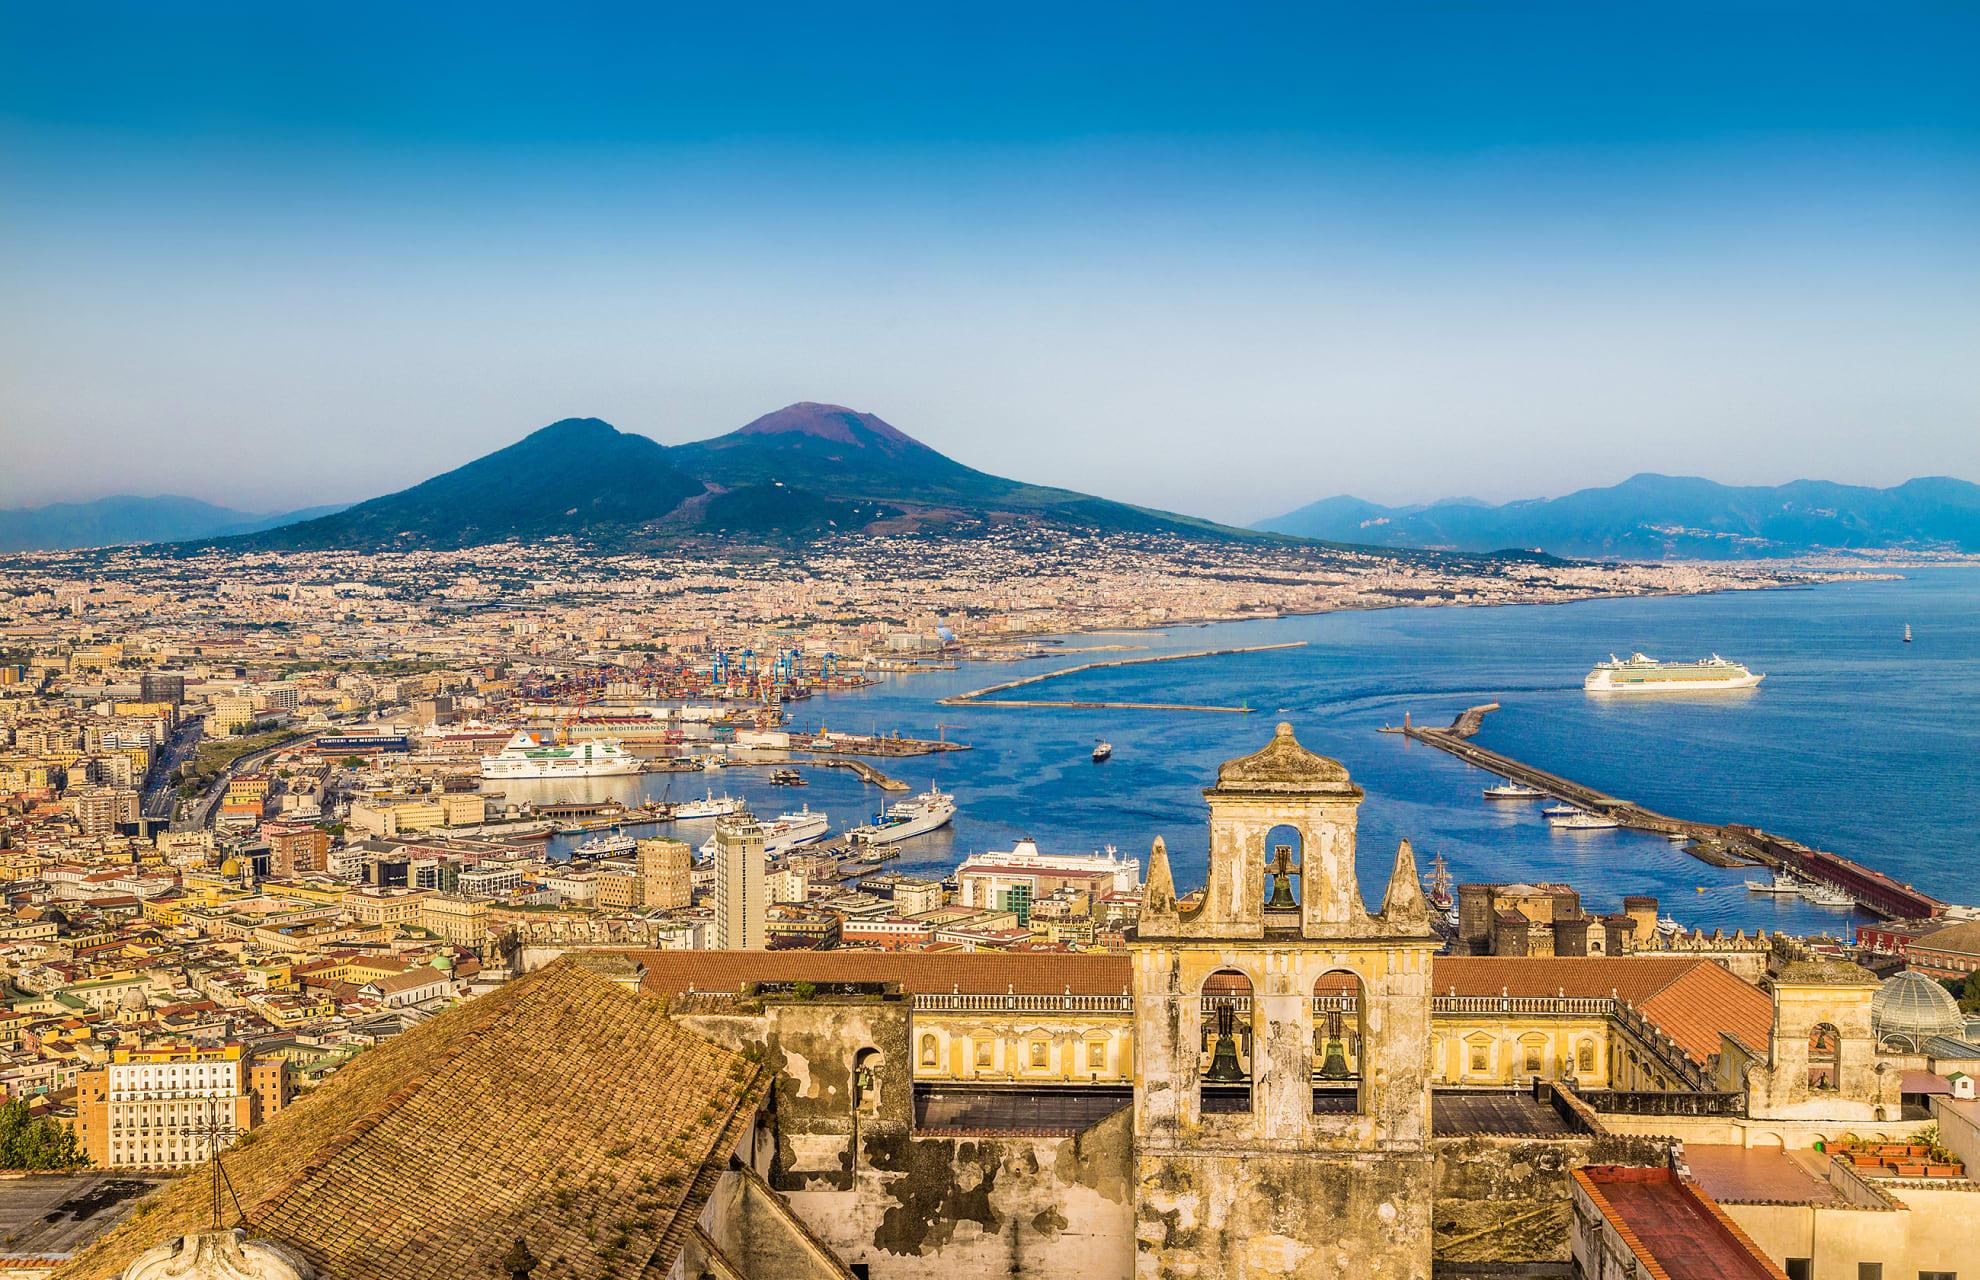 Campania - Archaeological Walks with Raffaele around Campania: Suprise Locations